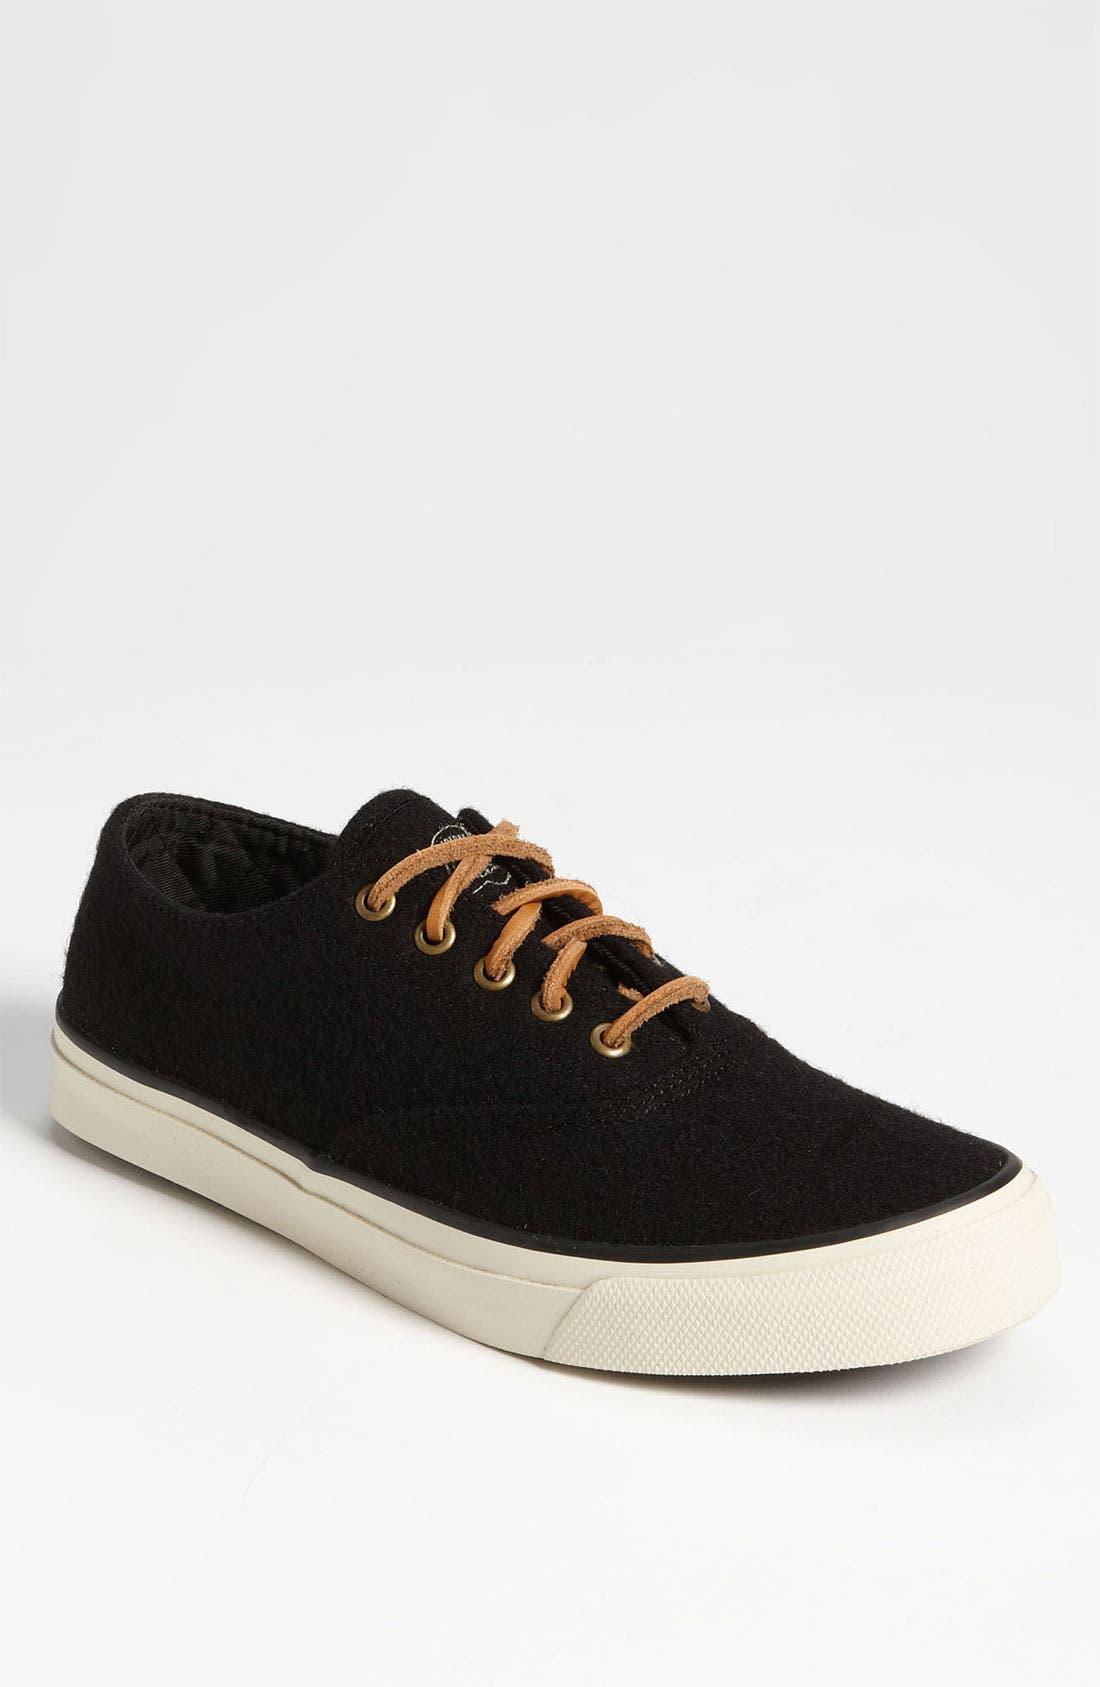 Main Image - Sperry Top-Sider® 'Fidelity - CVO' Wool Sneaker